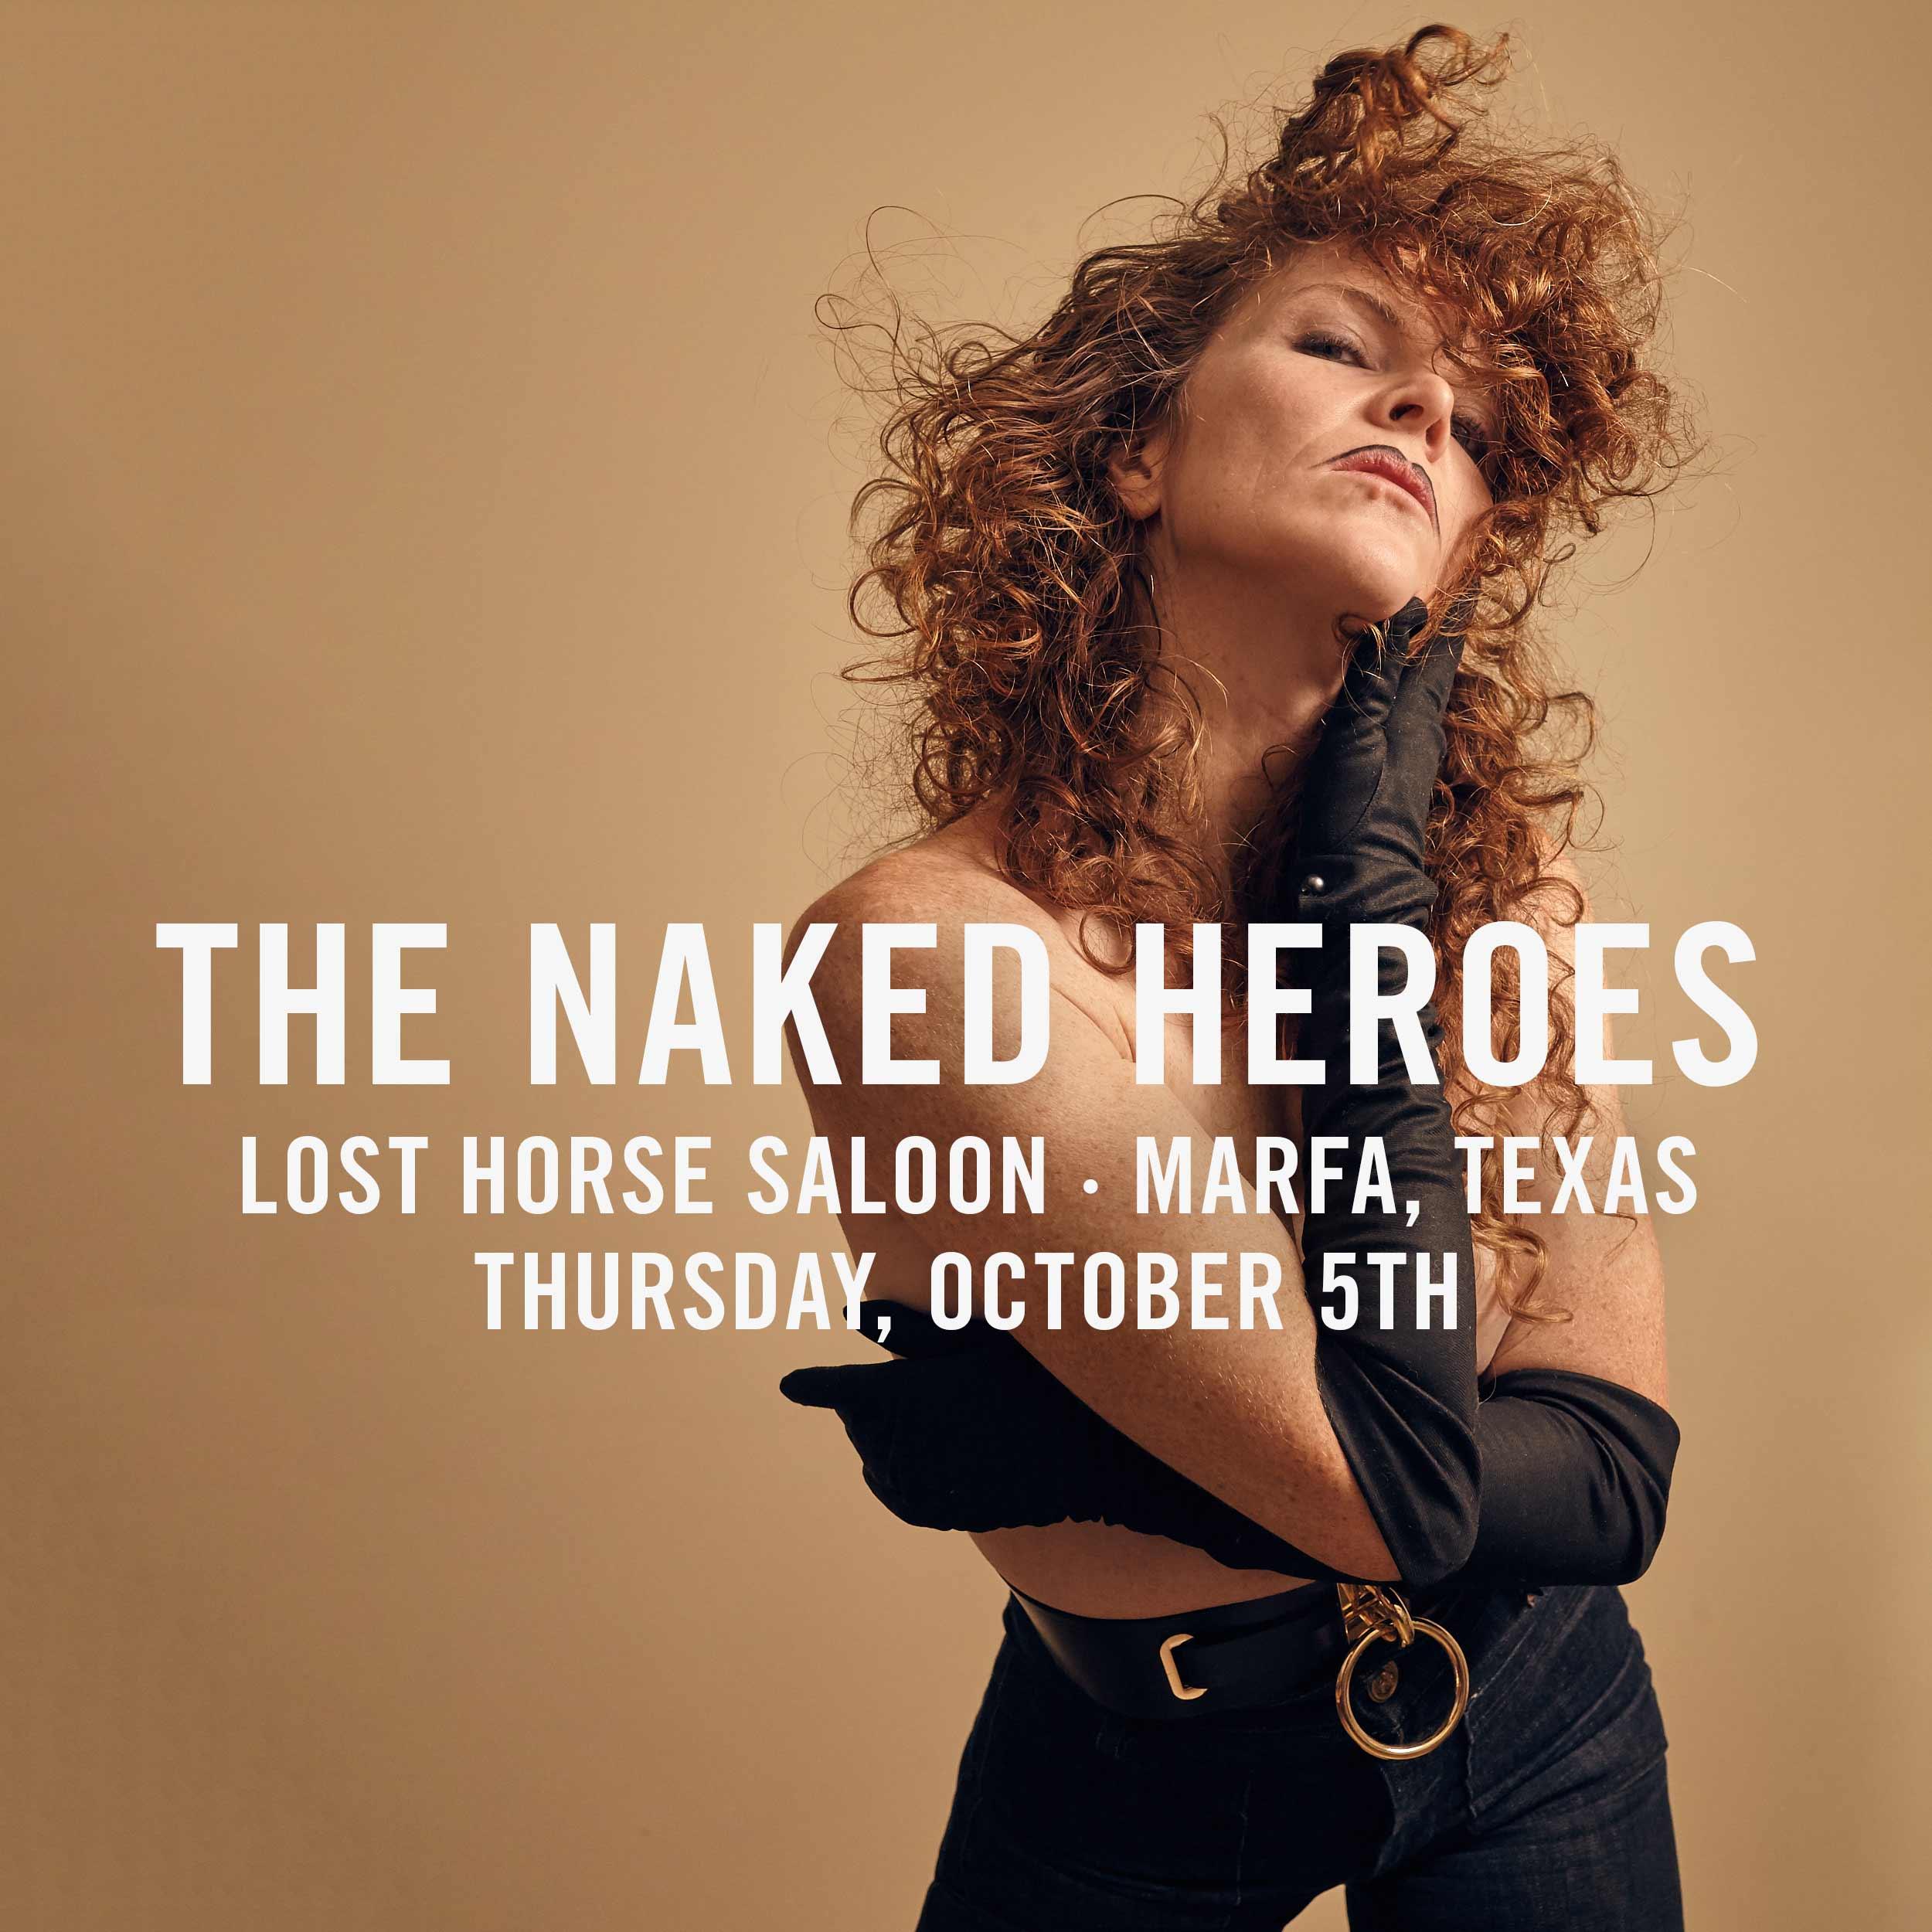 The-Naked-Heroes_Lost-Horse-Saloon-Marfa-Texas.jpg